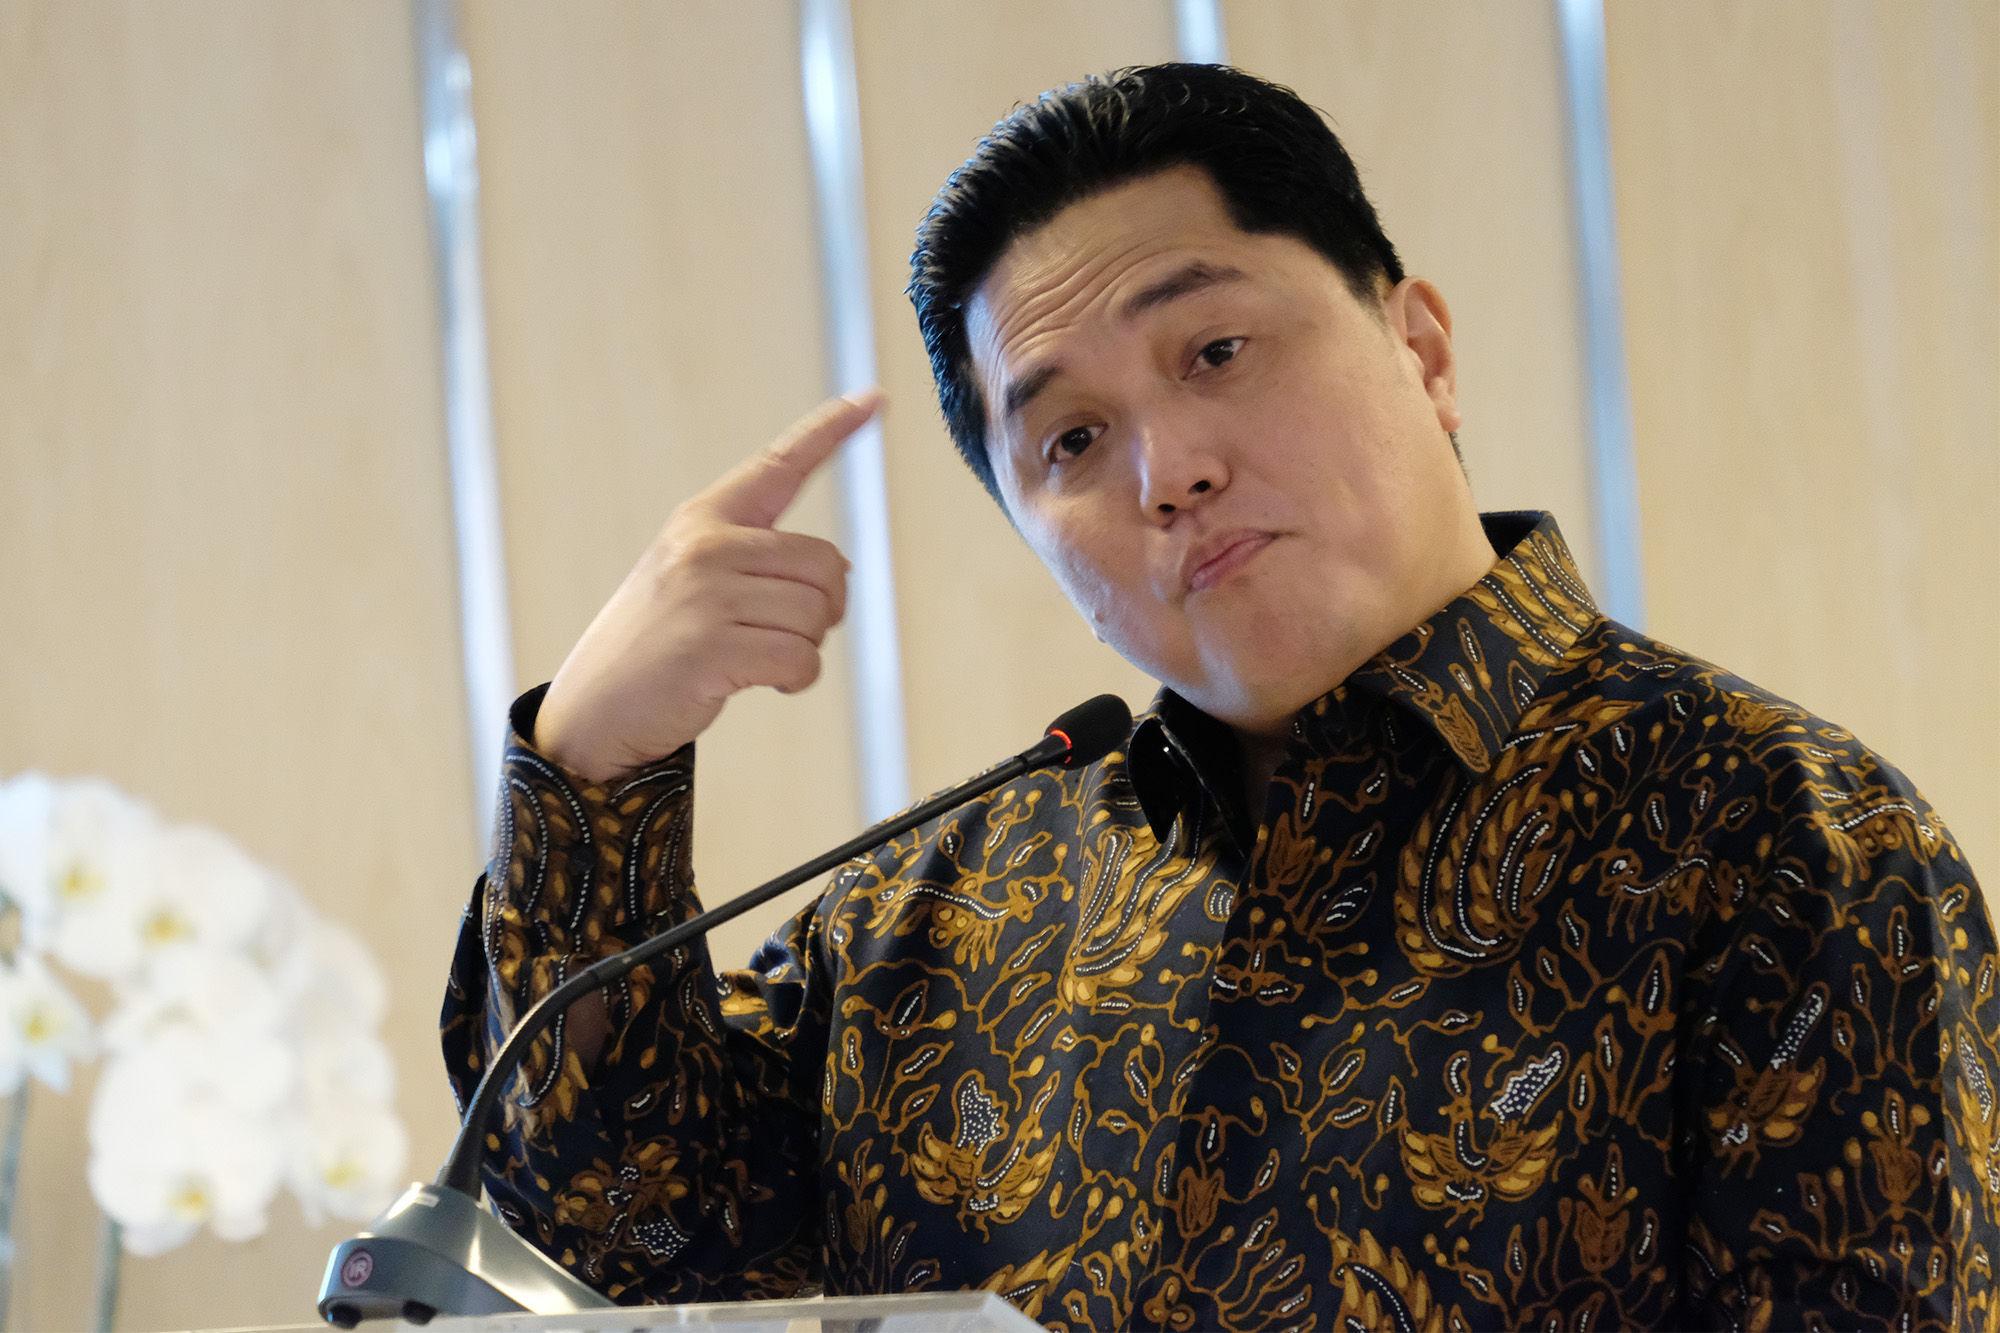 PPA Ambil Alih Hak Saham Negara Senilai Rp2,95 Triliun di Indosat hingga Bukopin